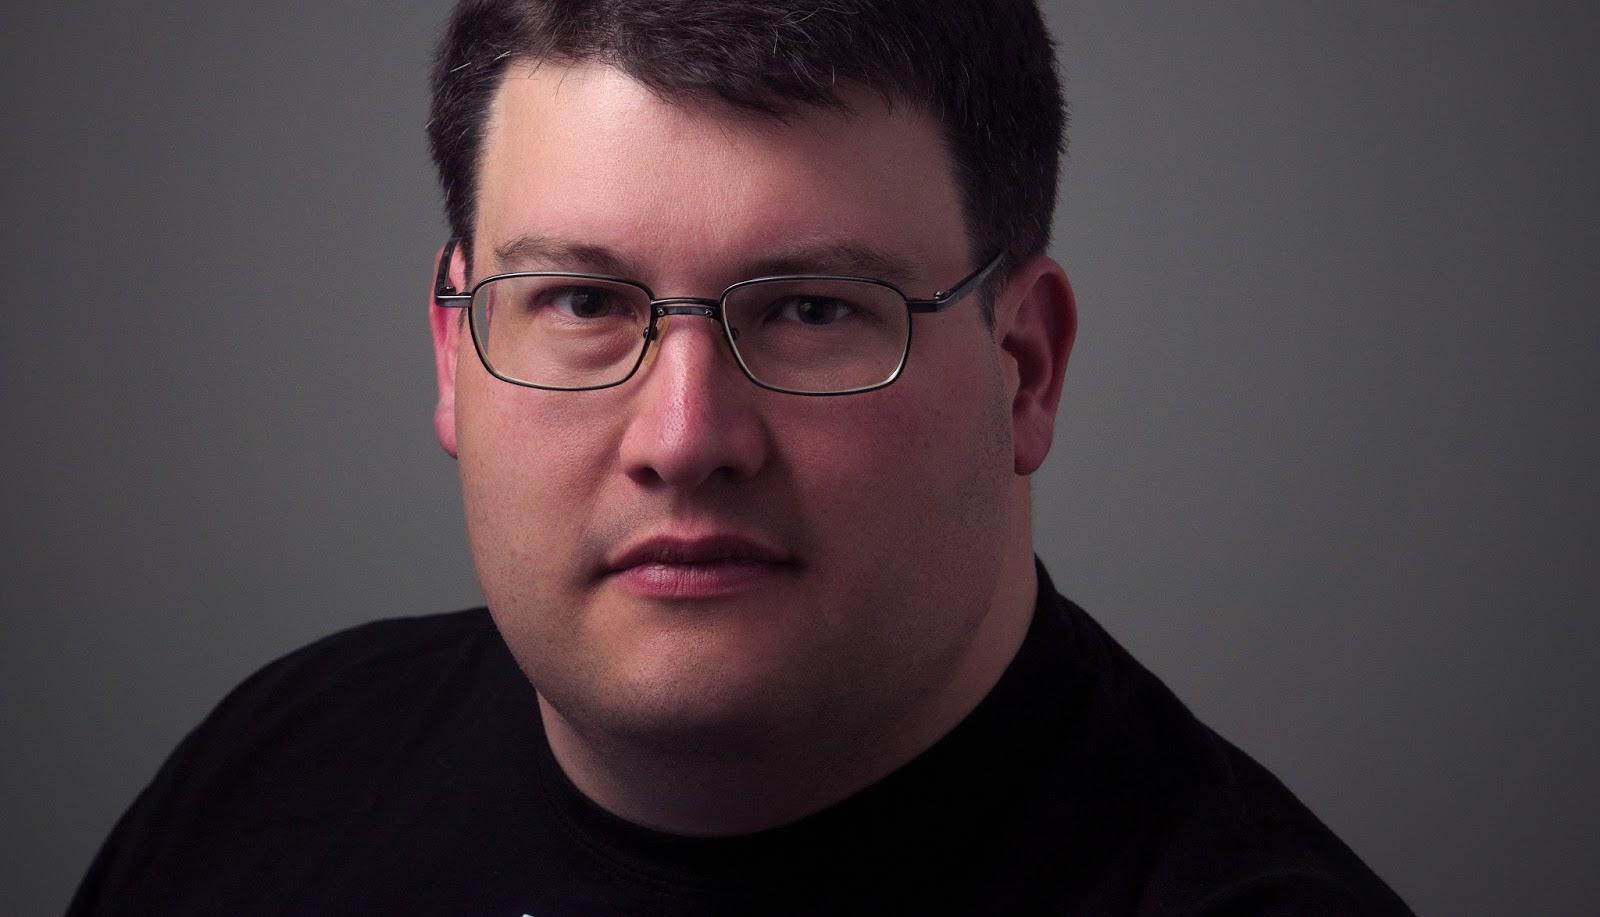 GIMP Team Michael headshot portrait LGM Pat David